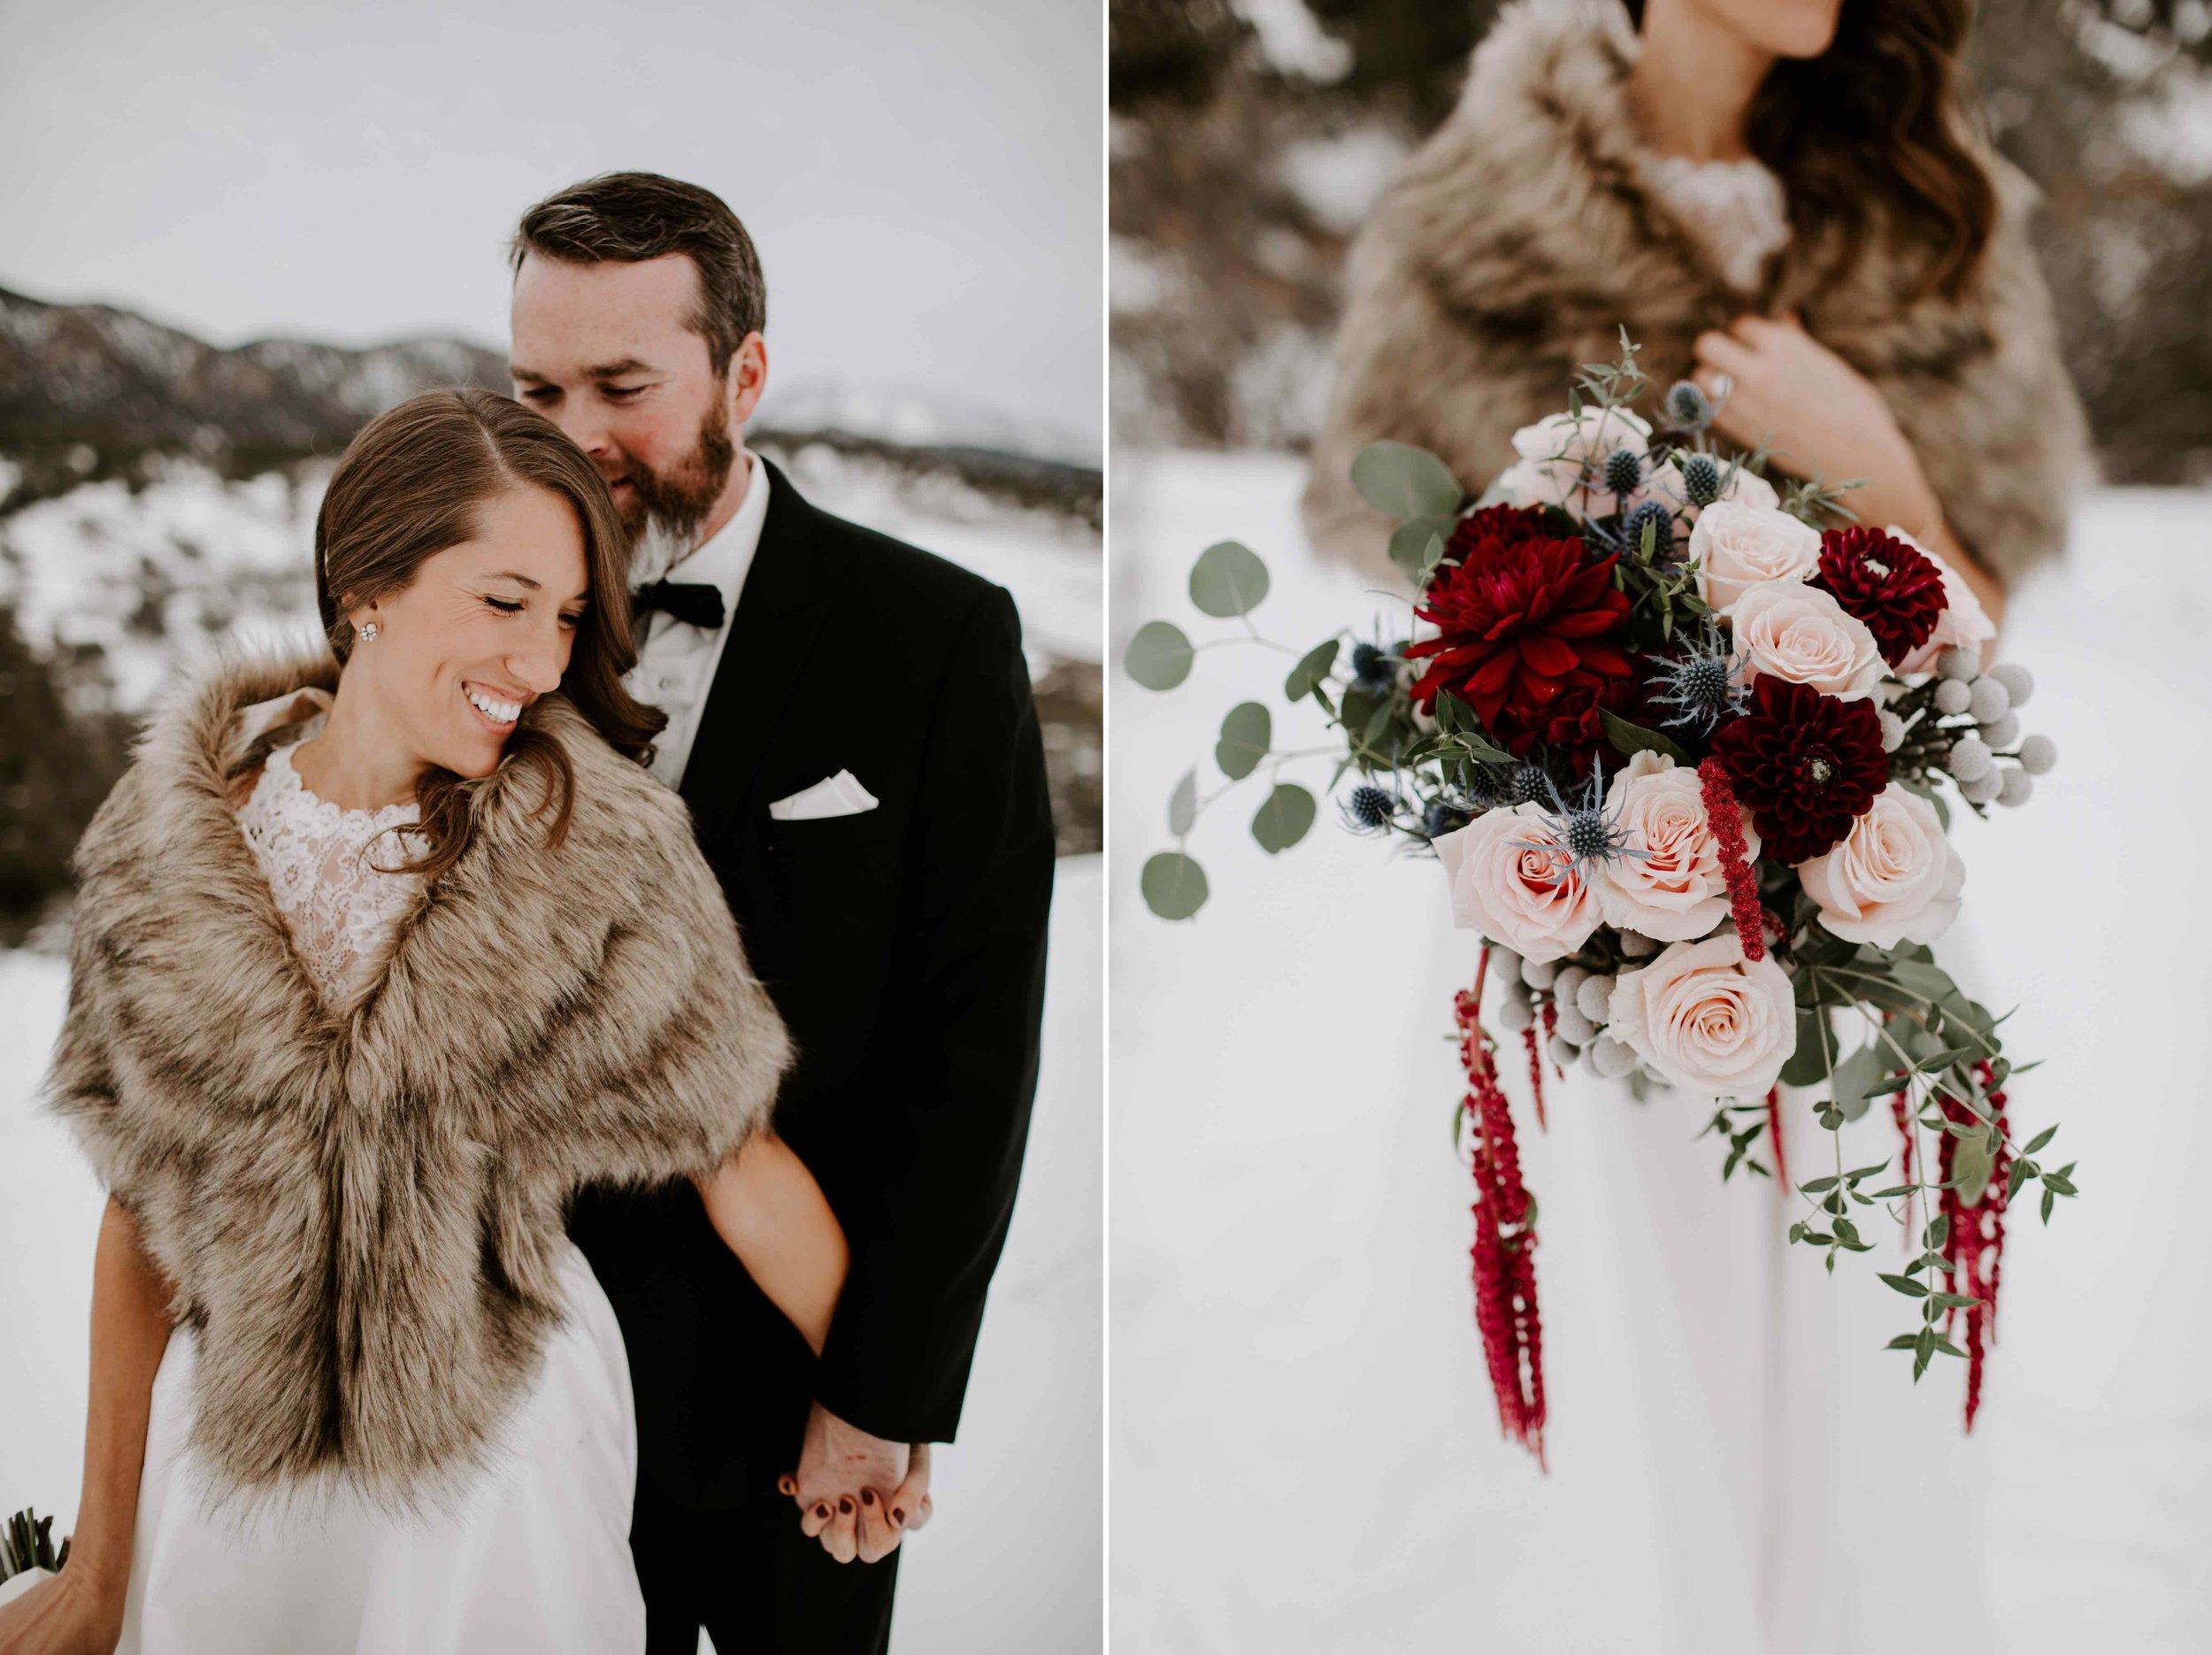 Kisa Conrad Favorites-0036-colorado-wedding-photographer-denver-springs-vailhotel-glenwood-springs-colorado-wedding-photographer.jpeg